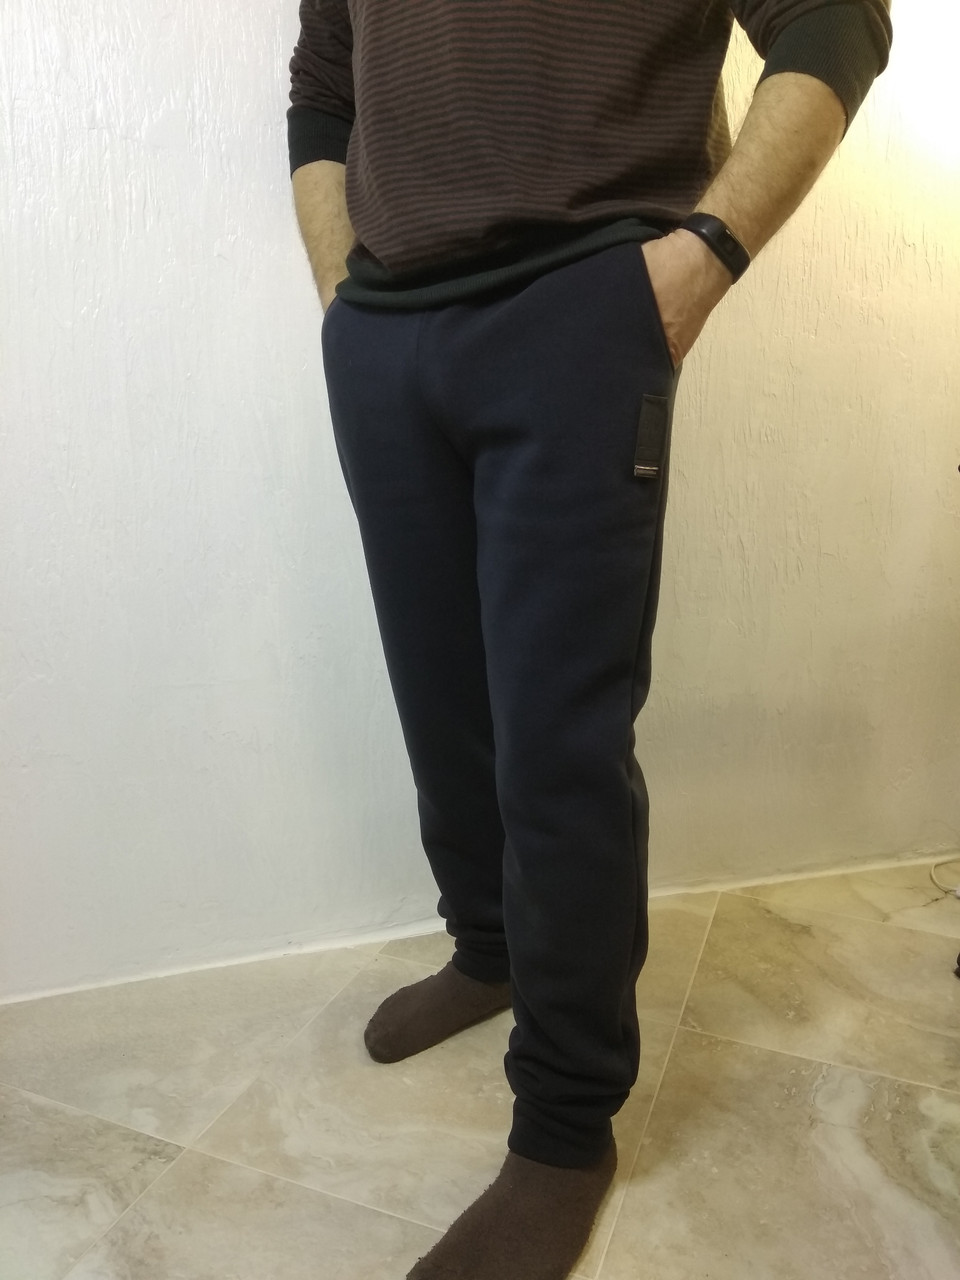 Спортивные штаны на манжетах мужские 50 размер